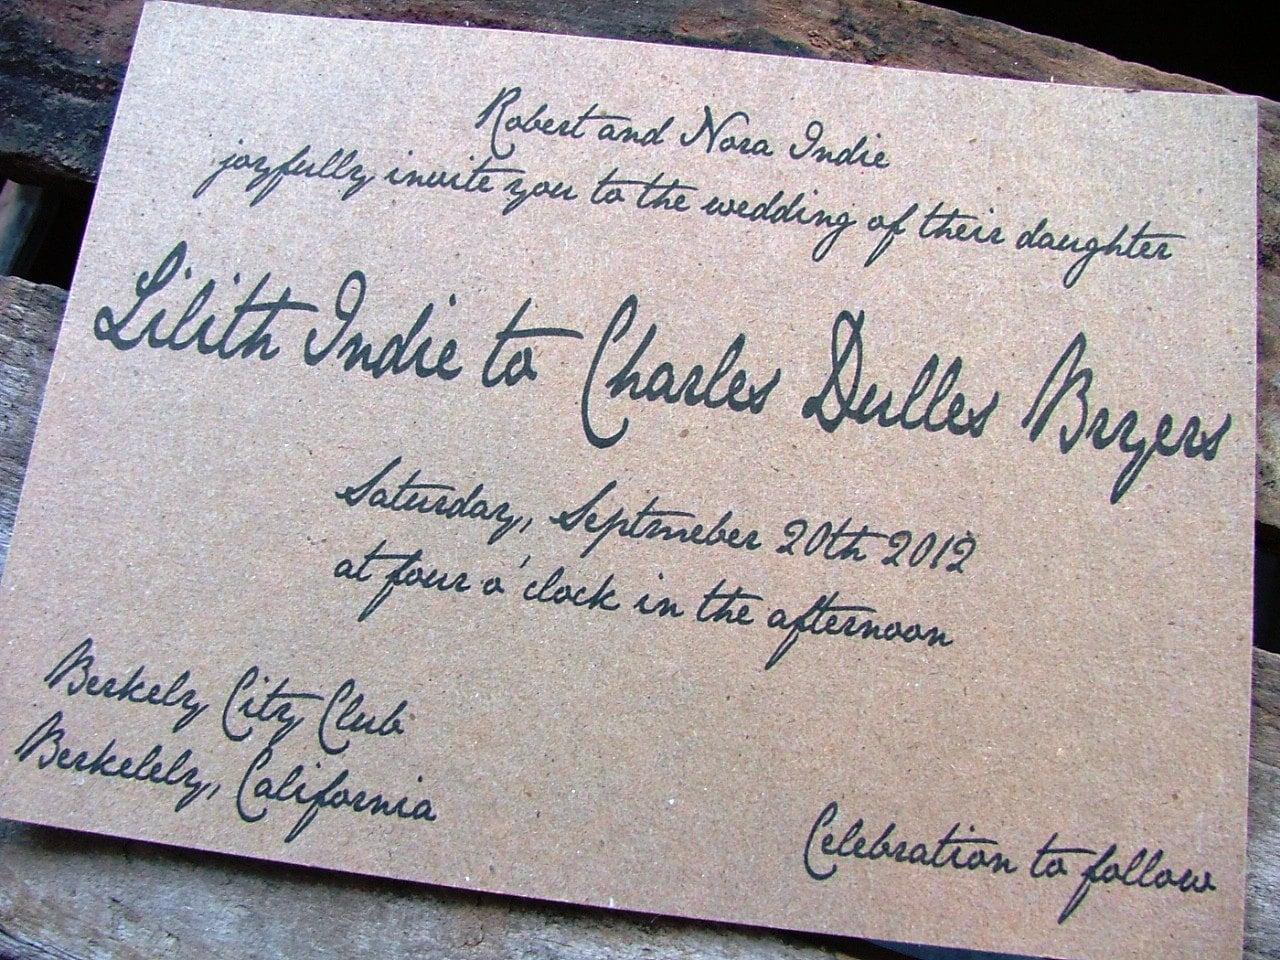 wedding invitations handwritten wedding handwritten wedding invitations wedding invitations handwritten wedding invites zoom